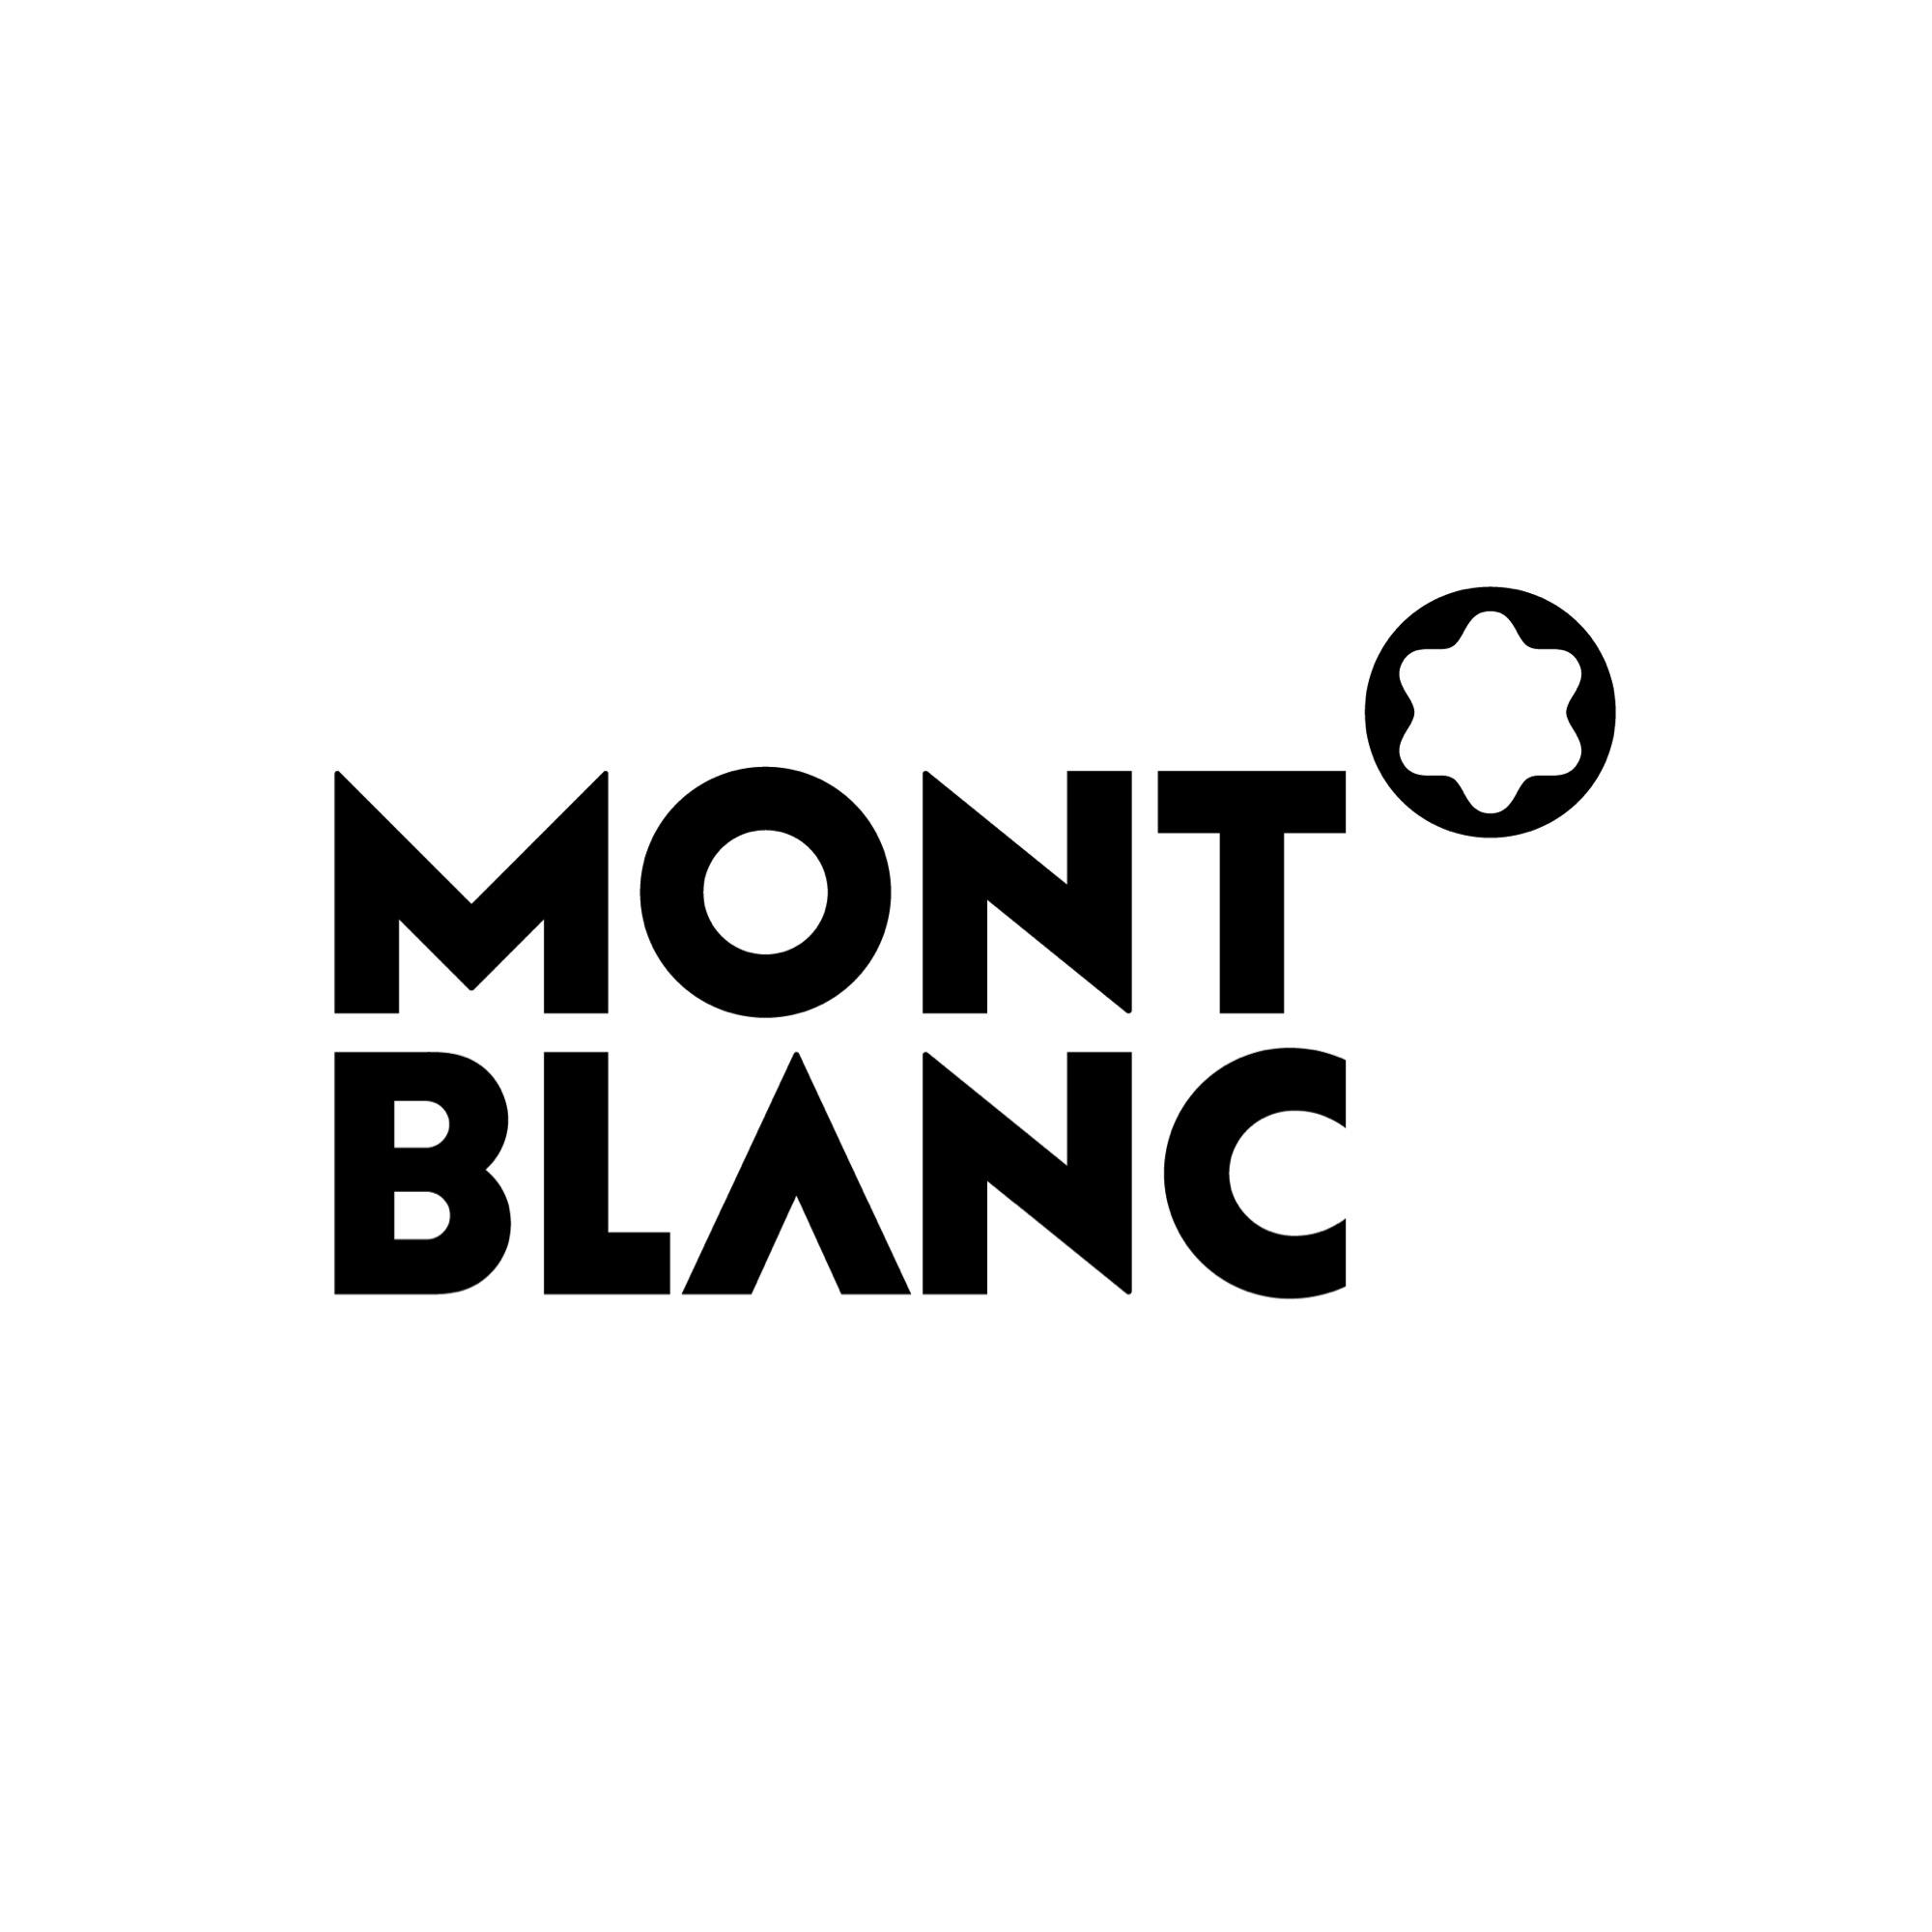 Montblanc Square.jpg